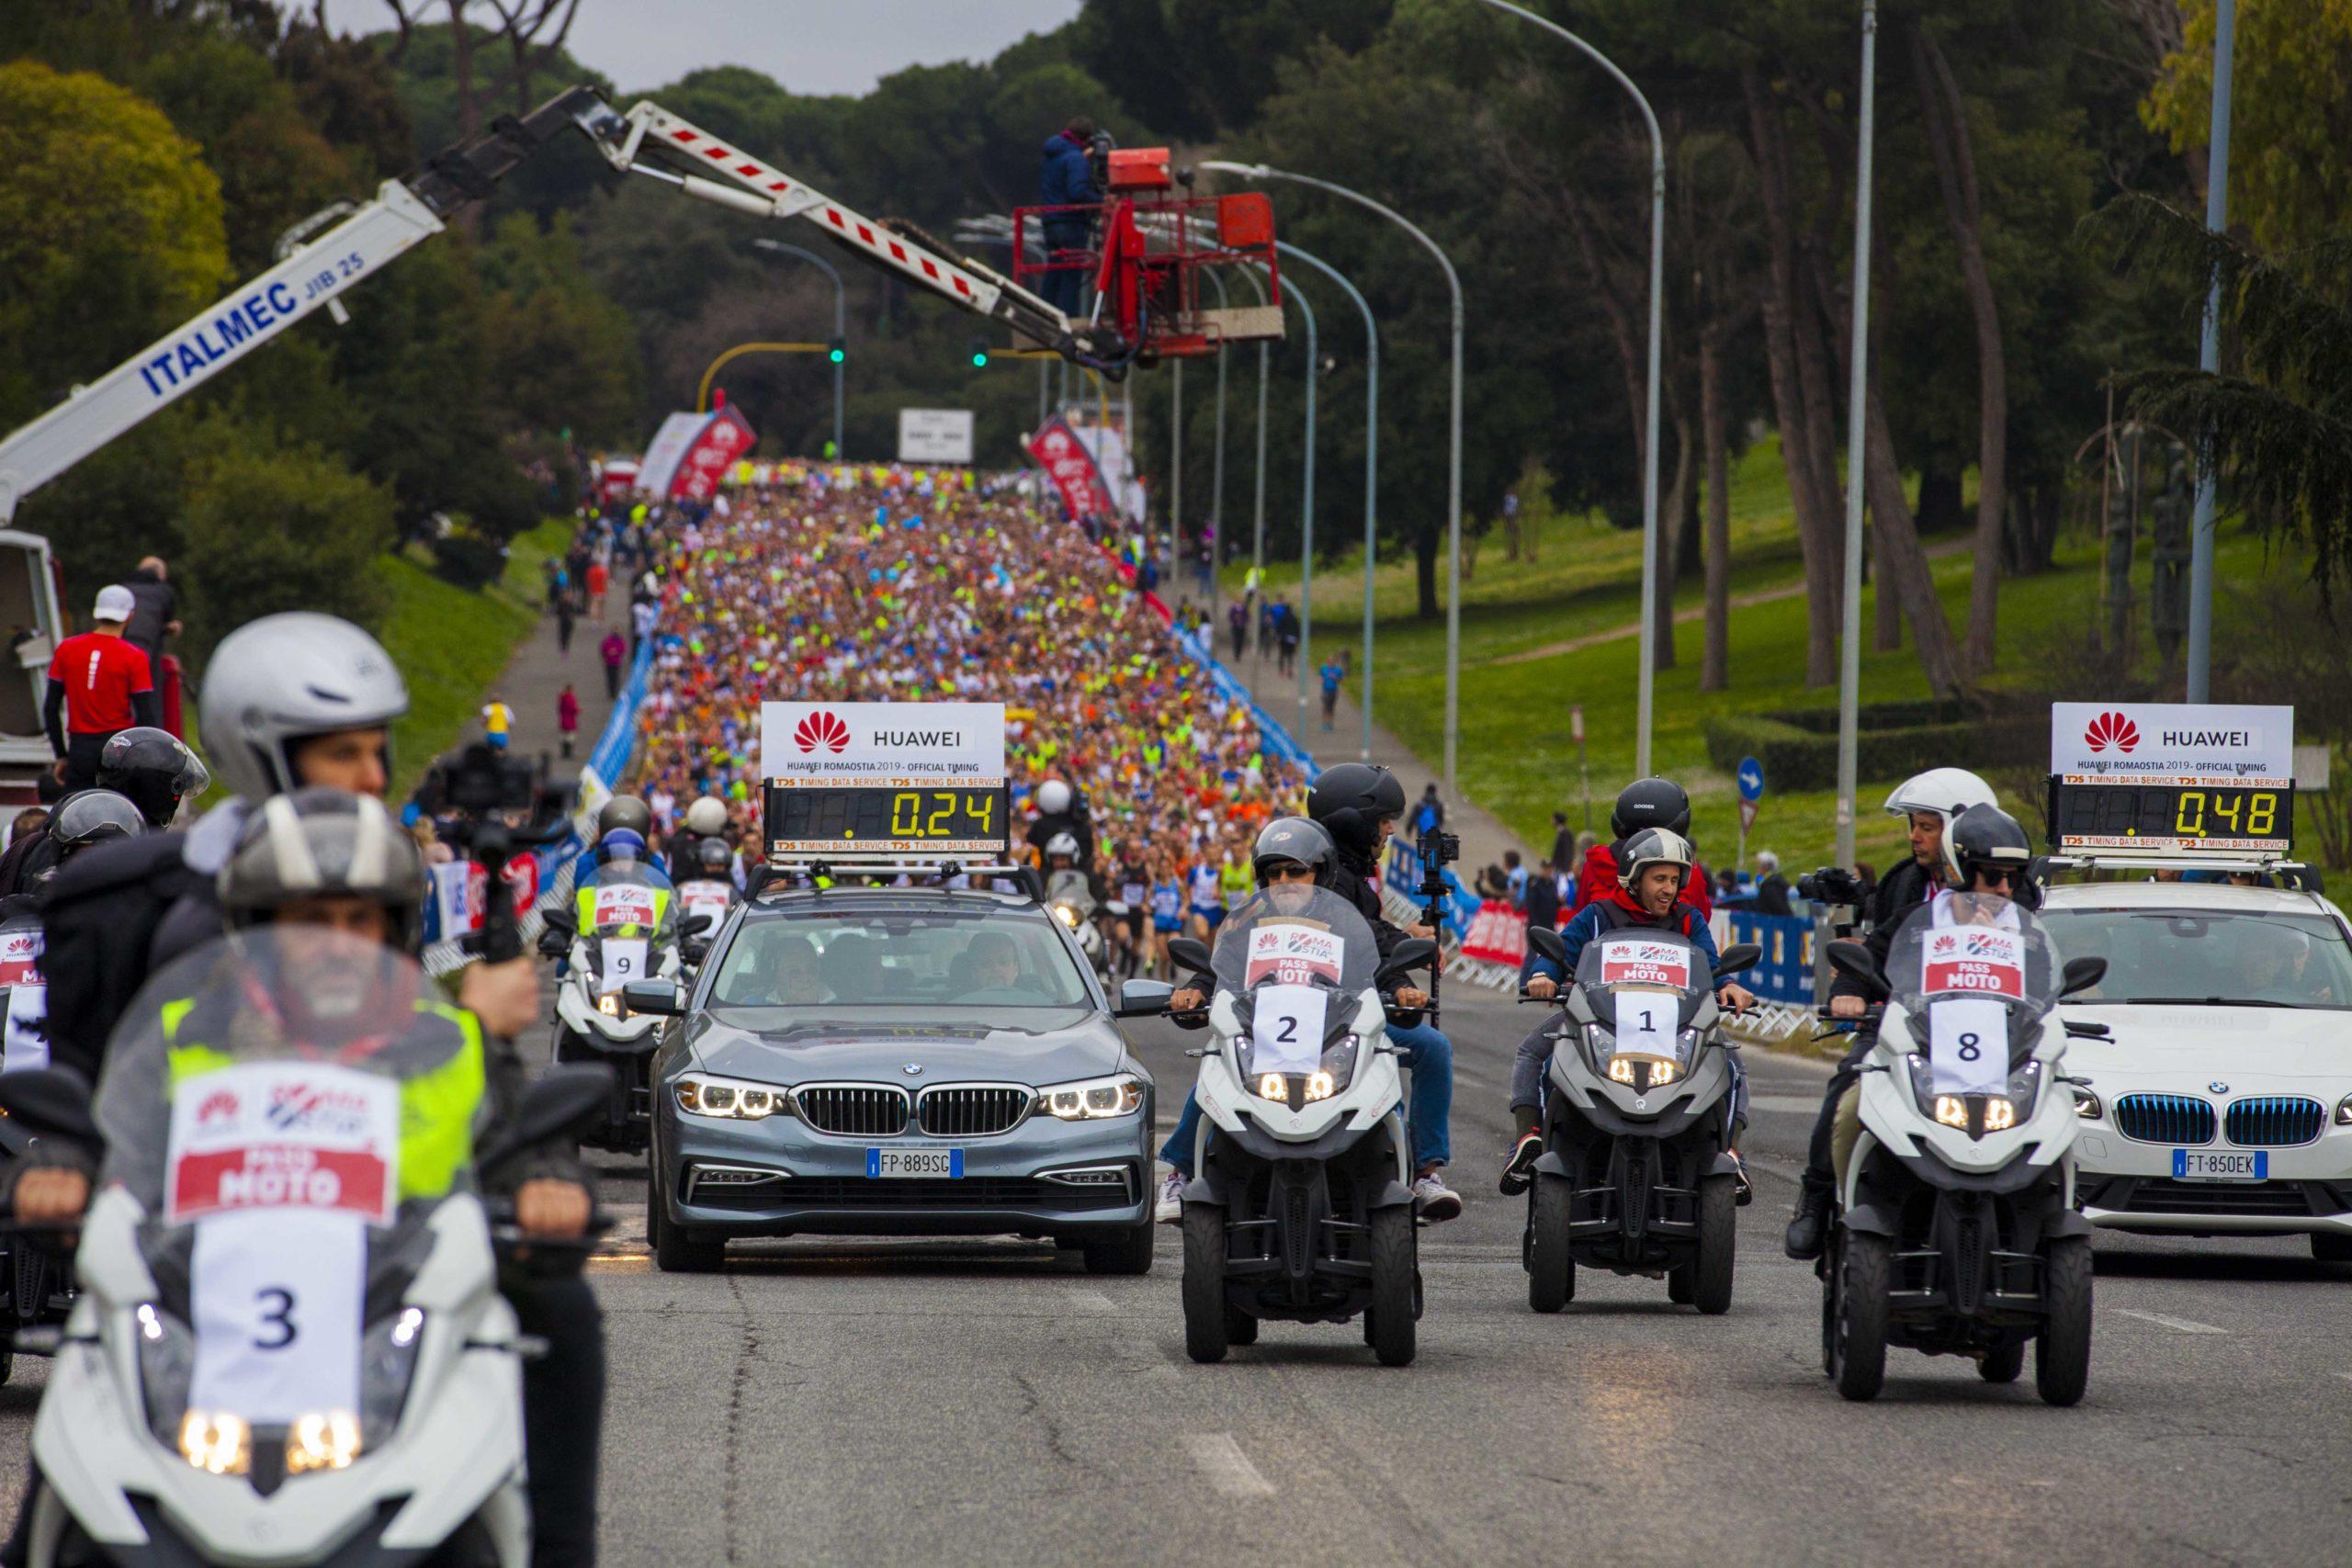 Huawei Marathons partecipanti